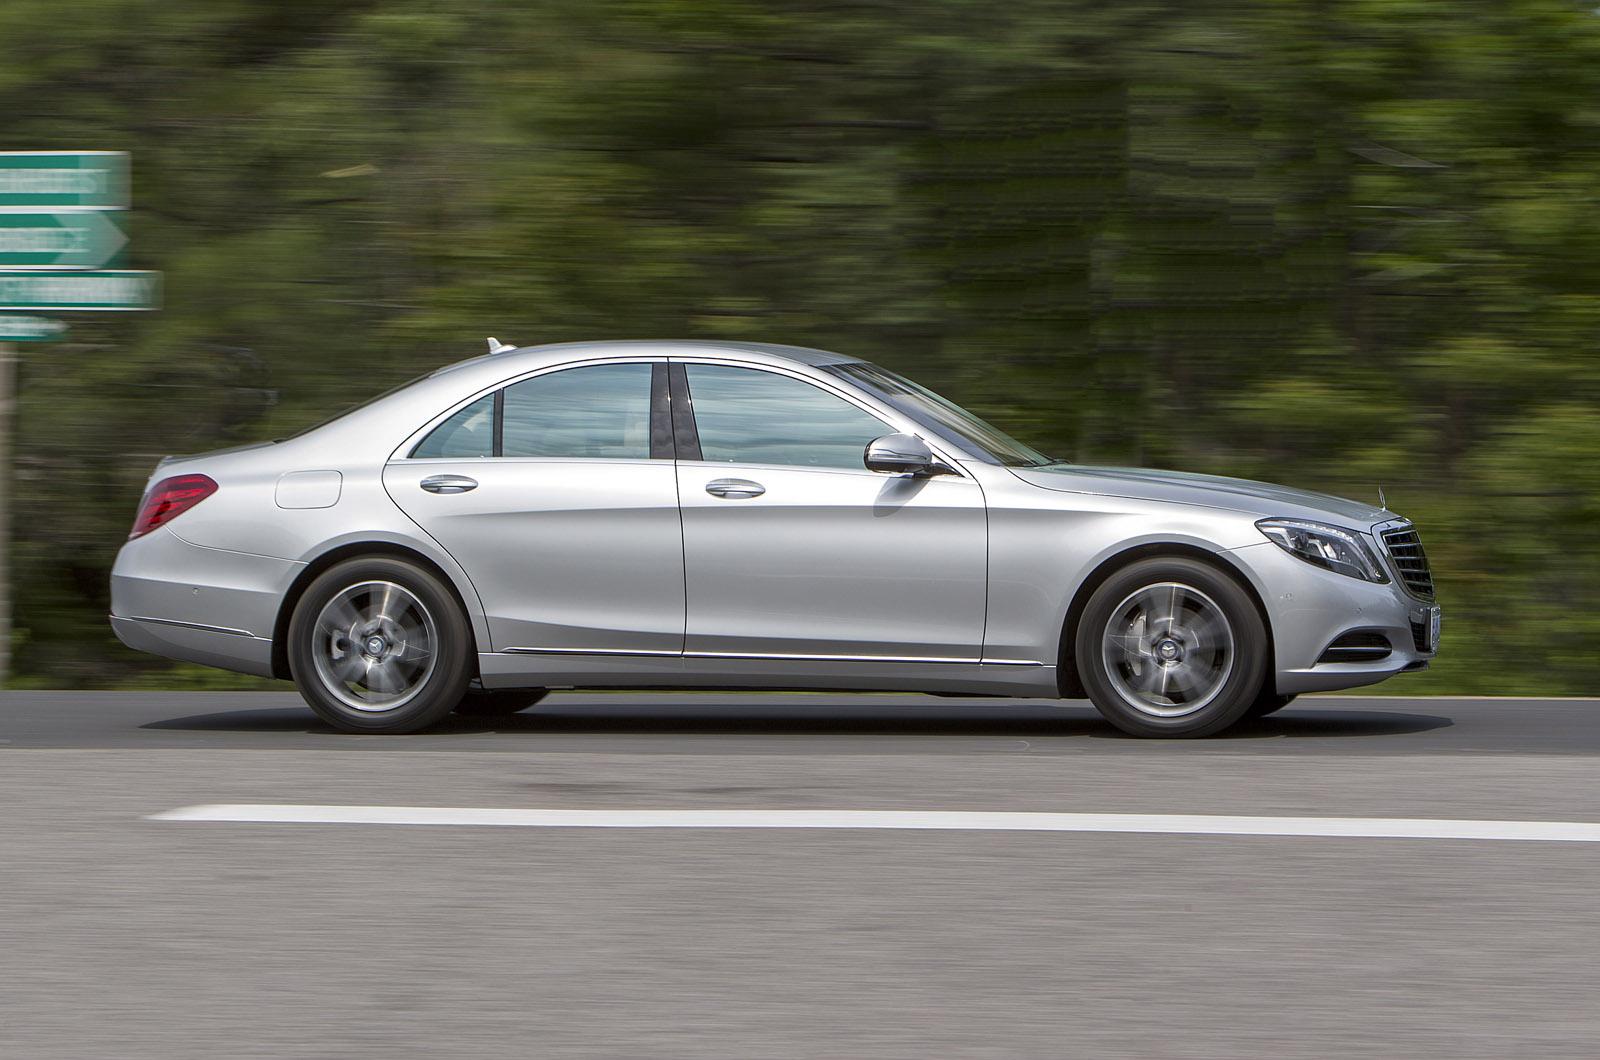 Mercedes benz s300 bluetec hybrid first drive for Mercedes benz hybrid uk